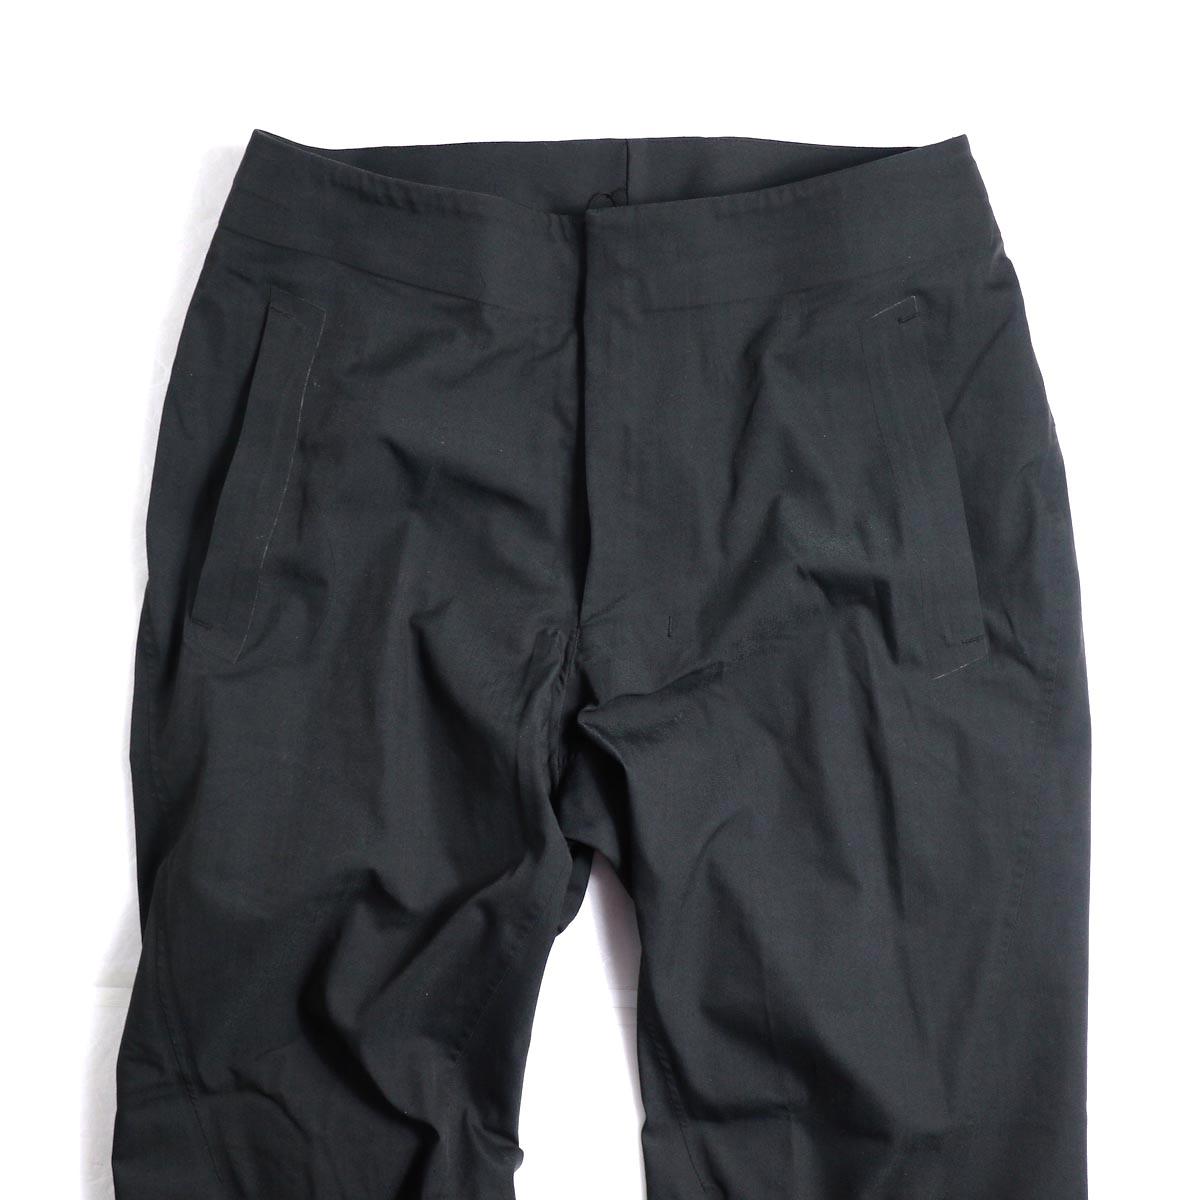 DESCENTE ALLTERAIN / Boa Long Pants Tapered Fit -Black ウエスト